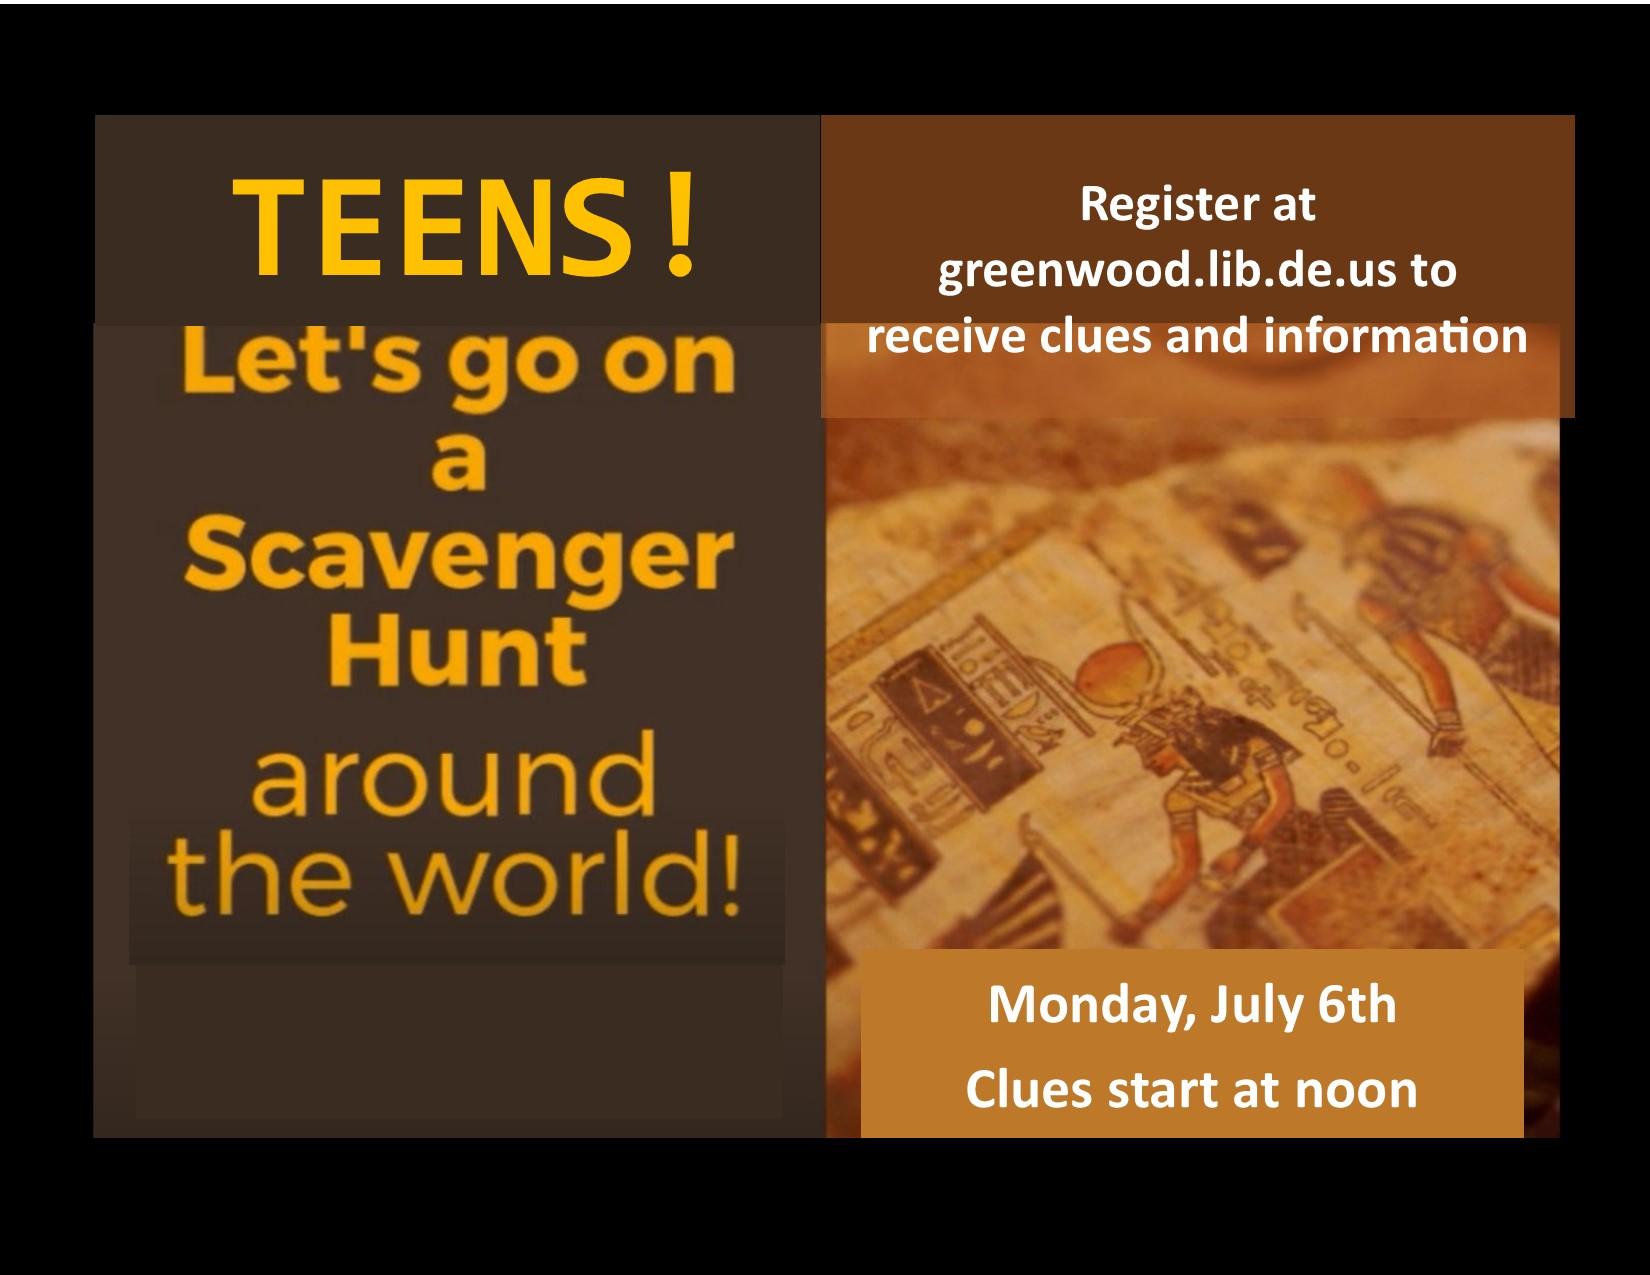 Greenwood Library Hosts Google Earth Scavenger Hunt